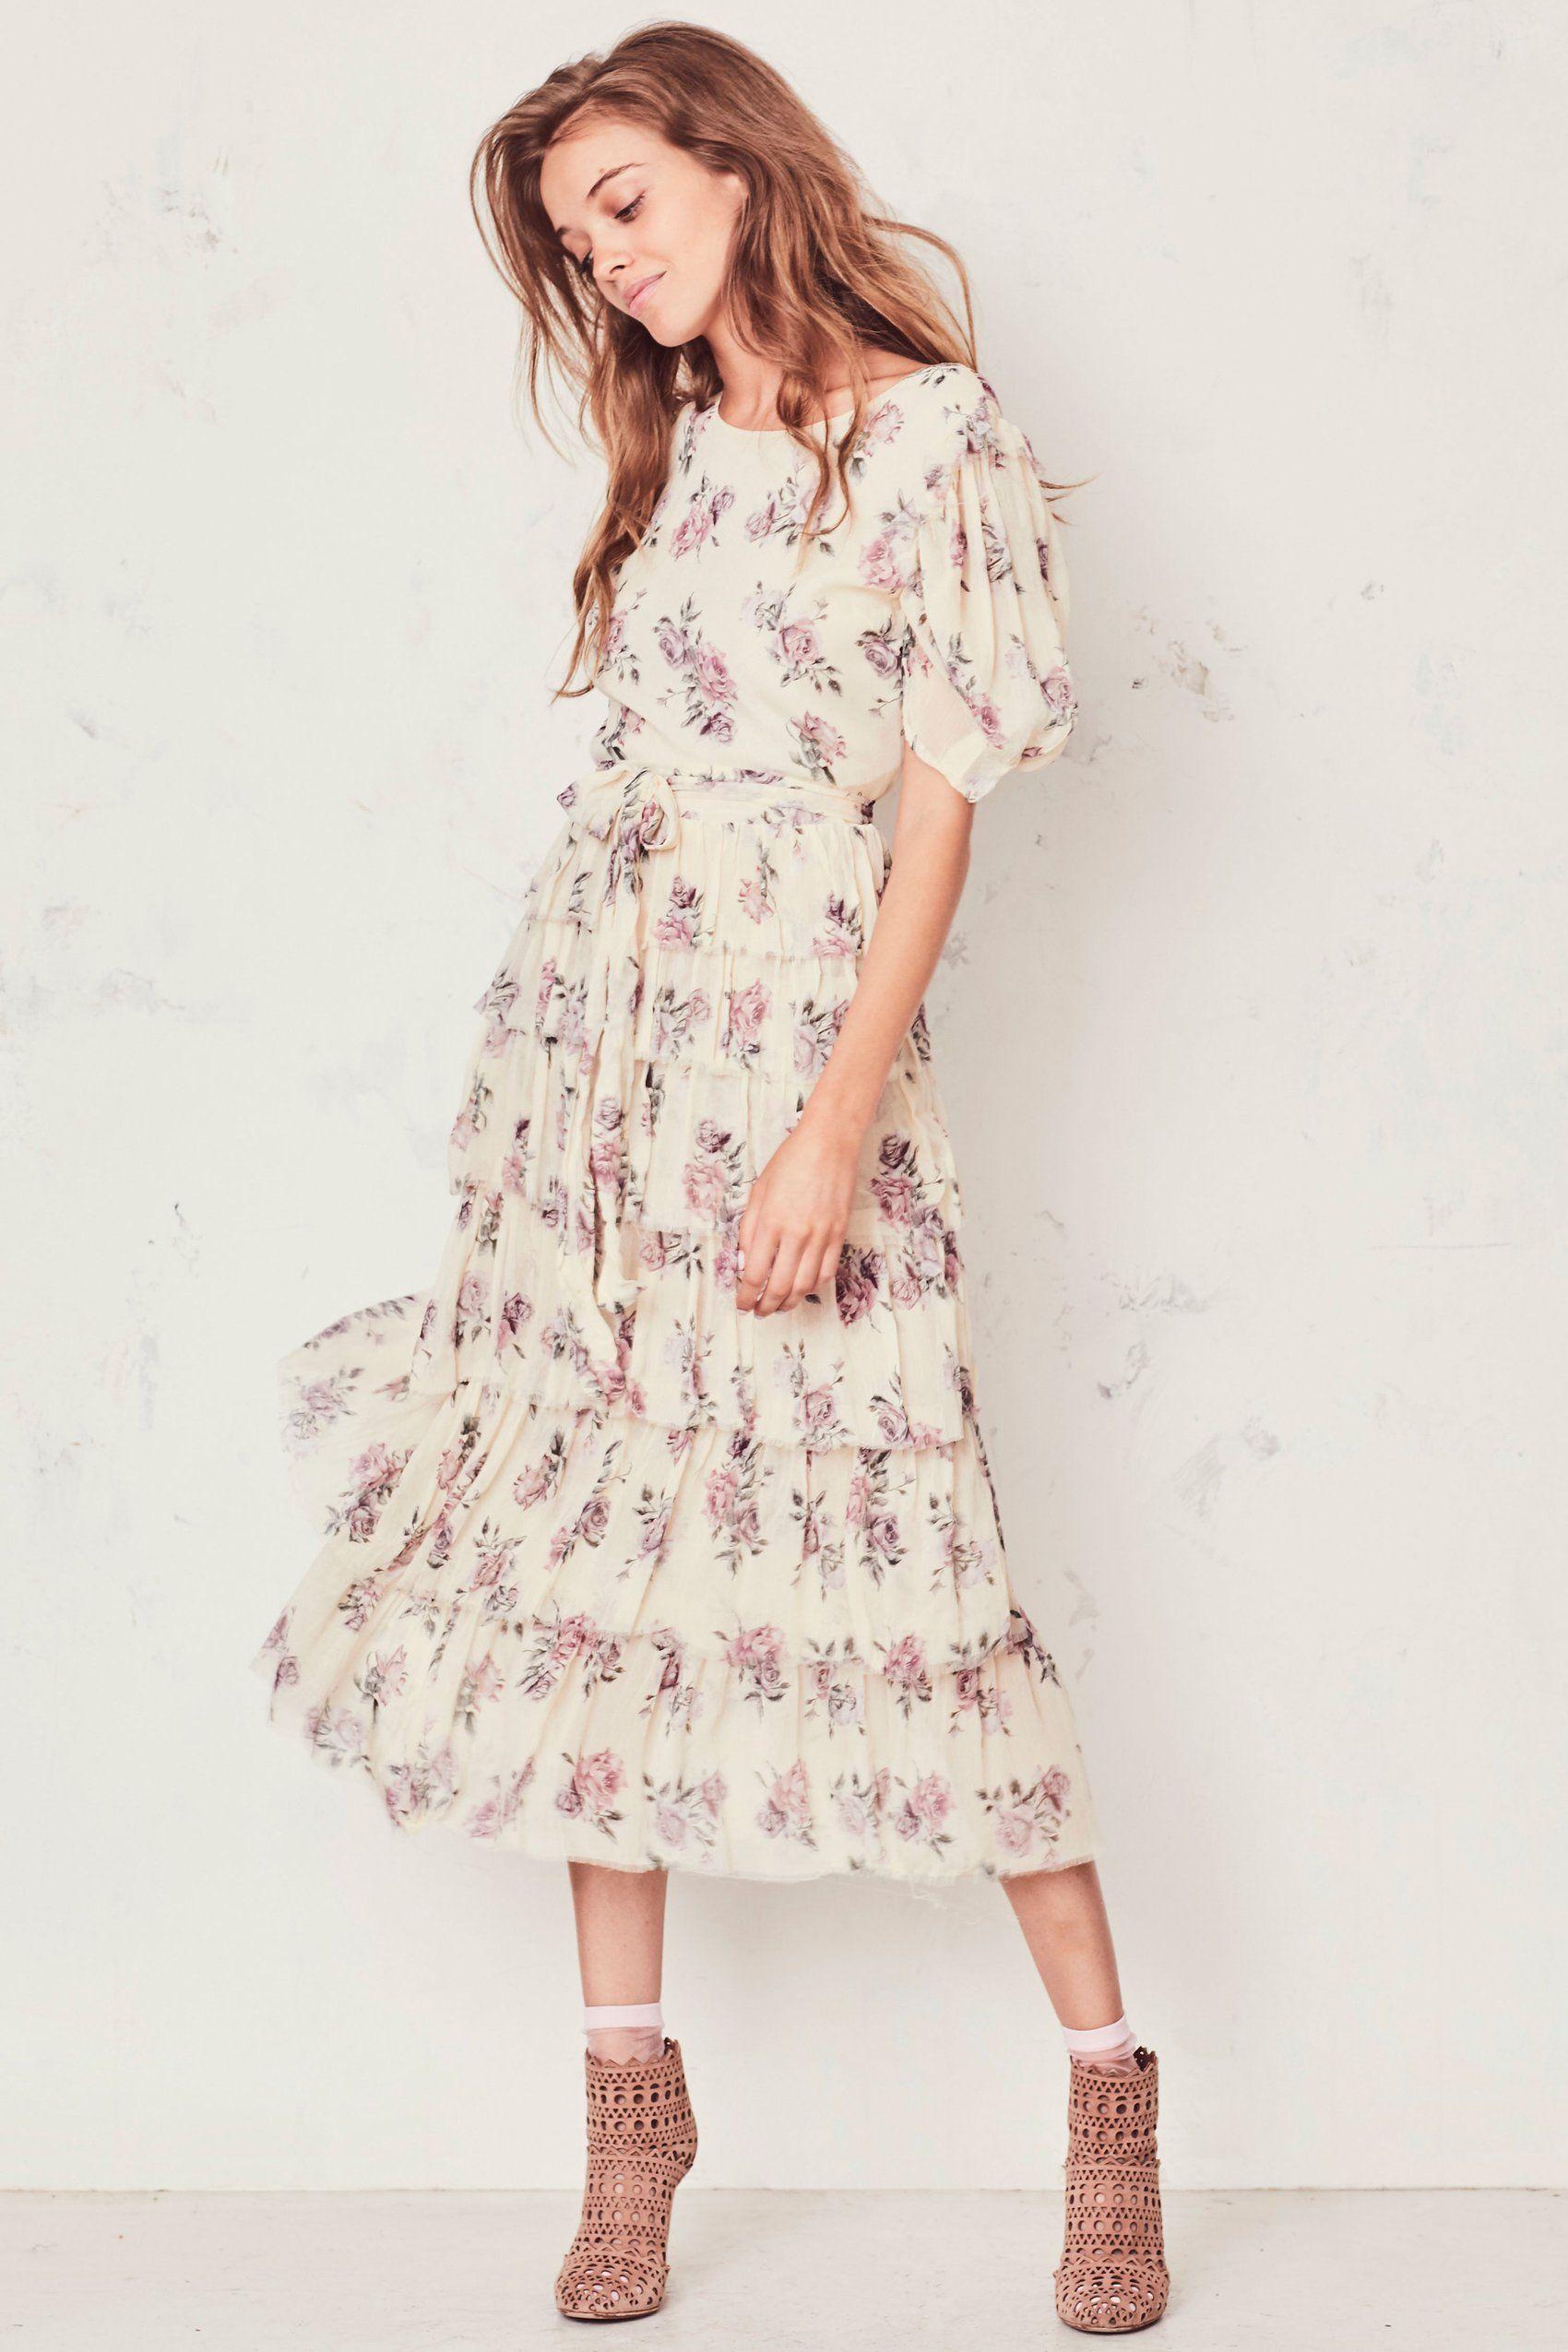 Very Fancy Dresses Fashion Clothes Women Midi Maxi Dress [ 2550 x 1700 Pixel ]